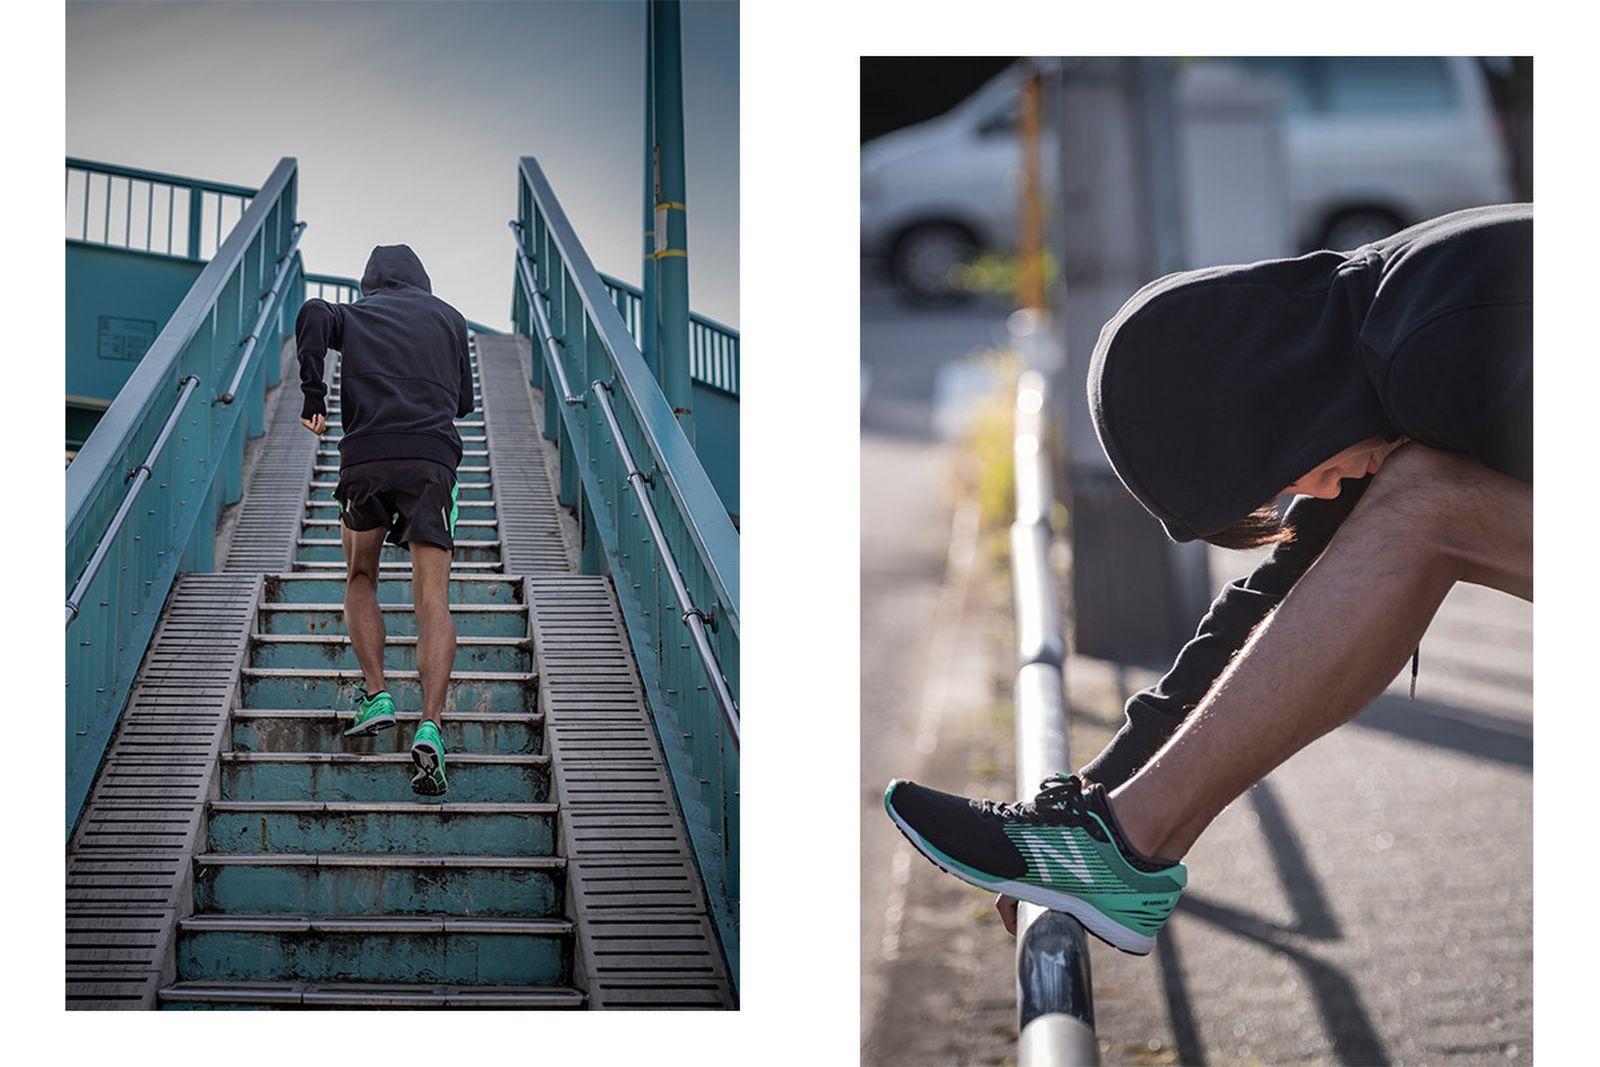 japans next great marathon runner got blessed god shoes07 1200x800 New Balance running shoes